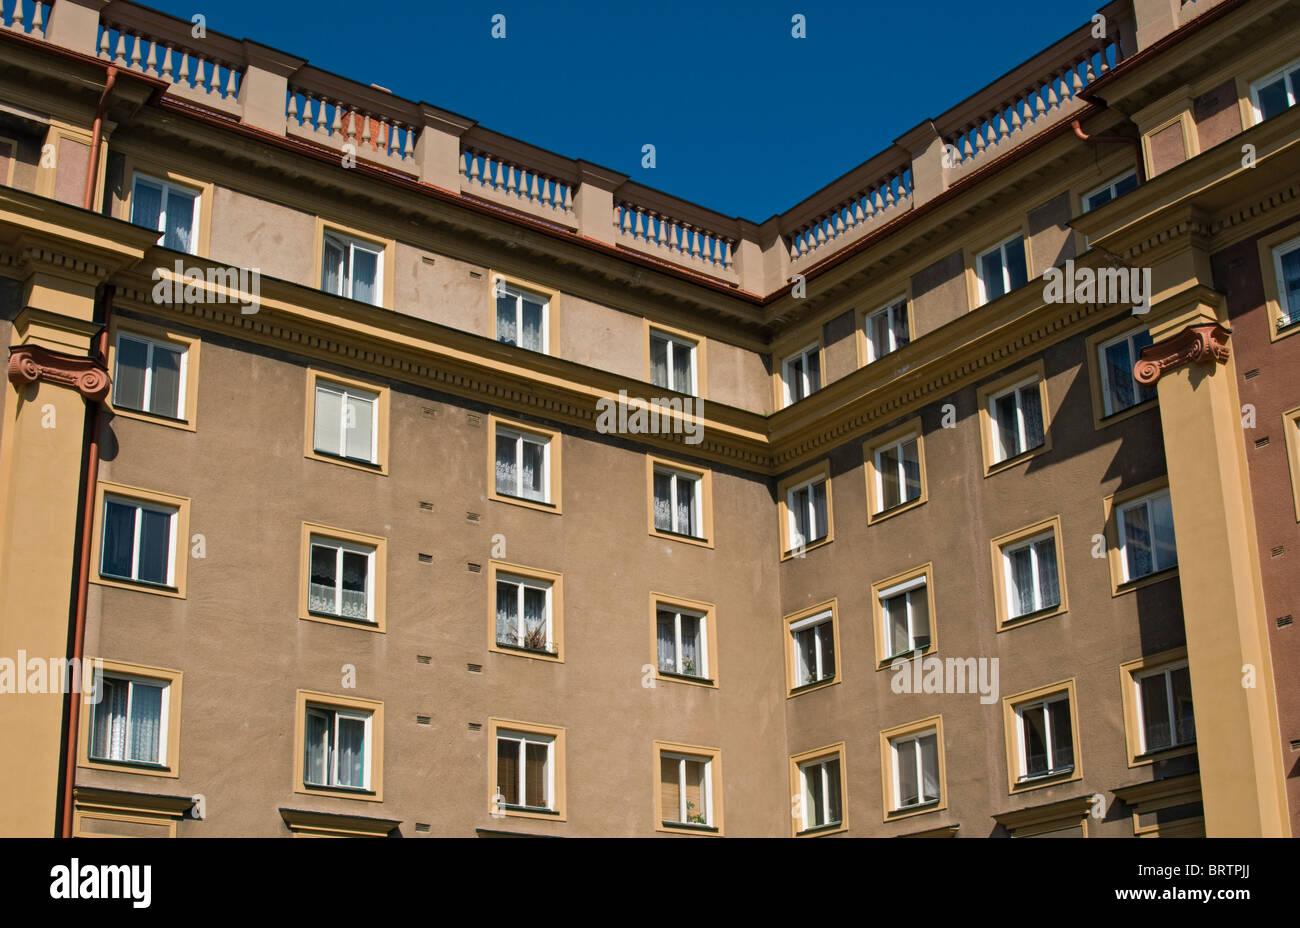 Apartment Building Built in Socialist Realism Architecture Style in 1950s, Hlavni trida, Poruba, Ostrava, Czech - Stock Image